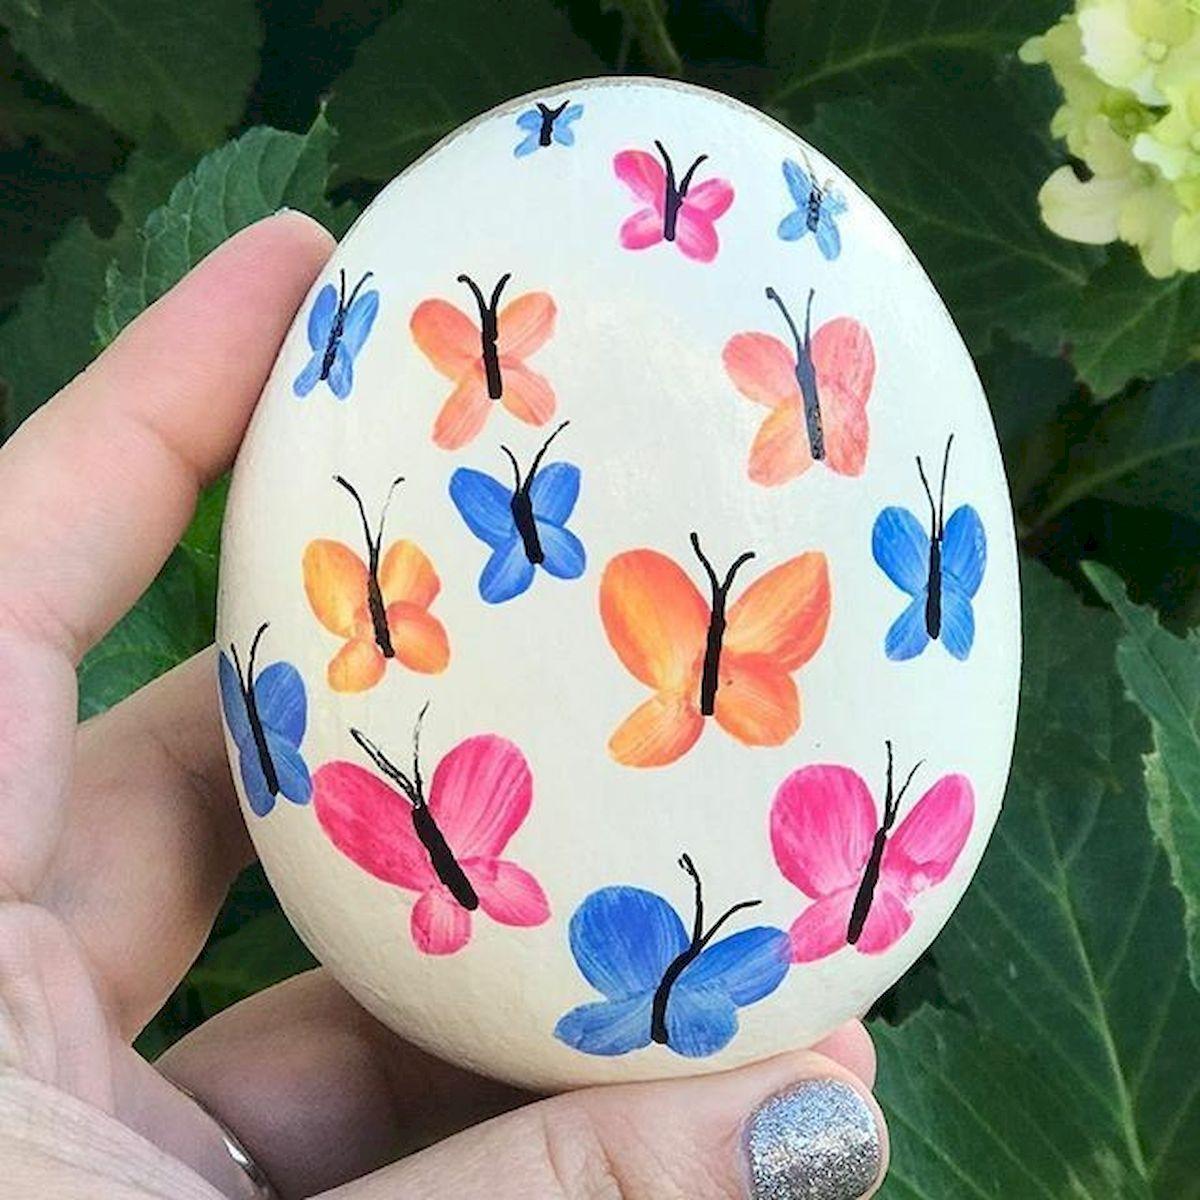 55 Cute DIY Painted Rocks Animals Butterfly Ideas (39)